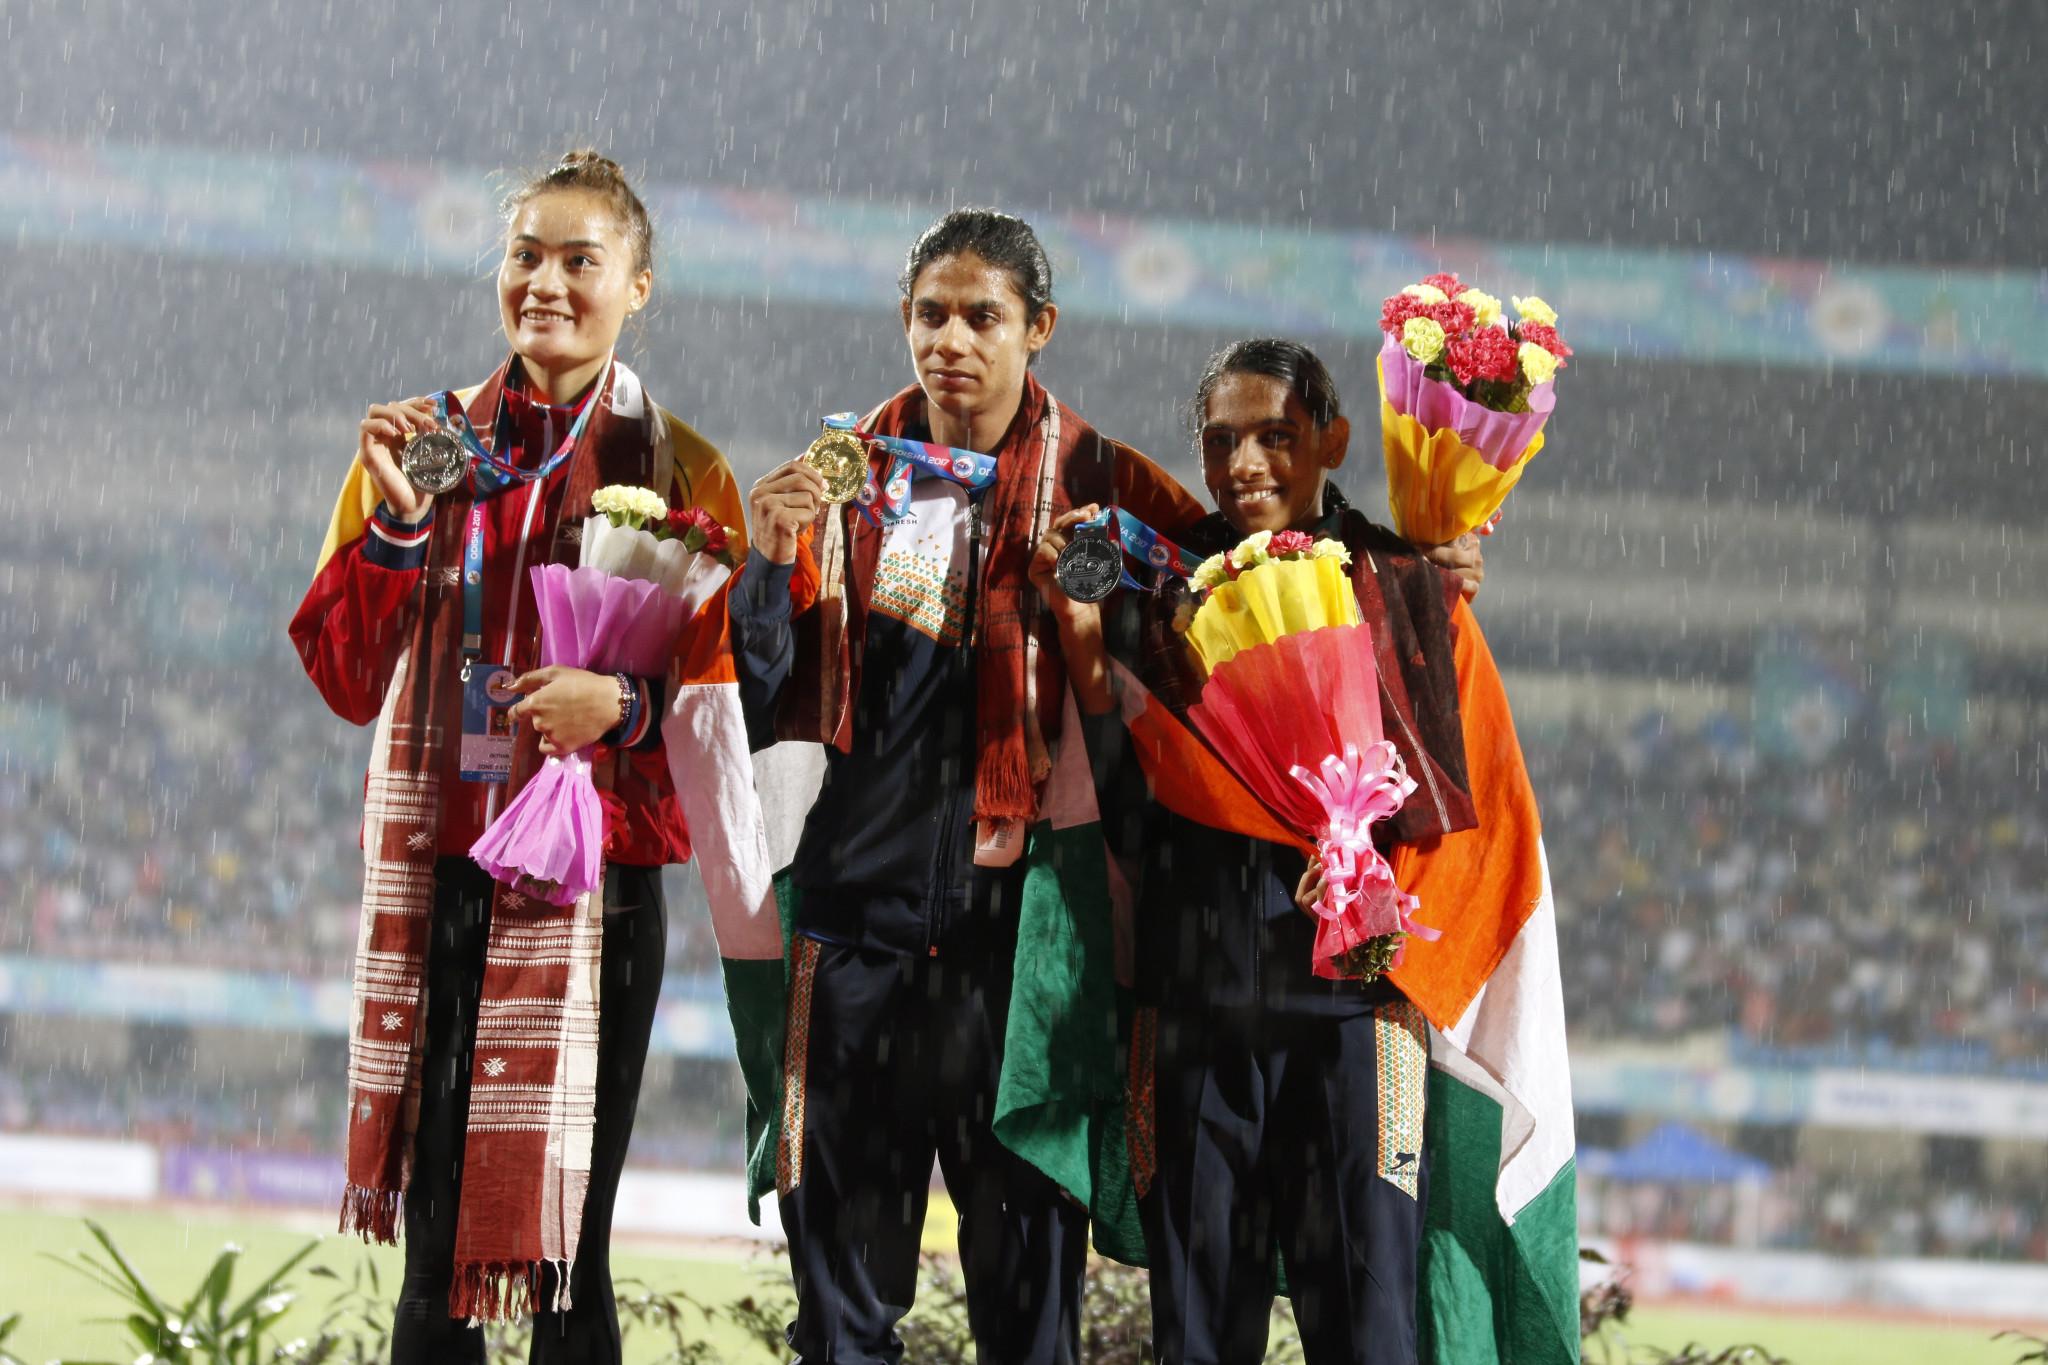 India's Nirmala Sheoran, centre, had won two gold medals at the 2017 Asian Championships in Bhubaneshwar ©Wikipedia